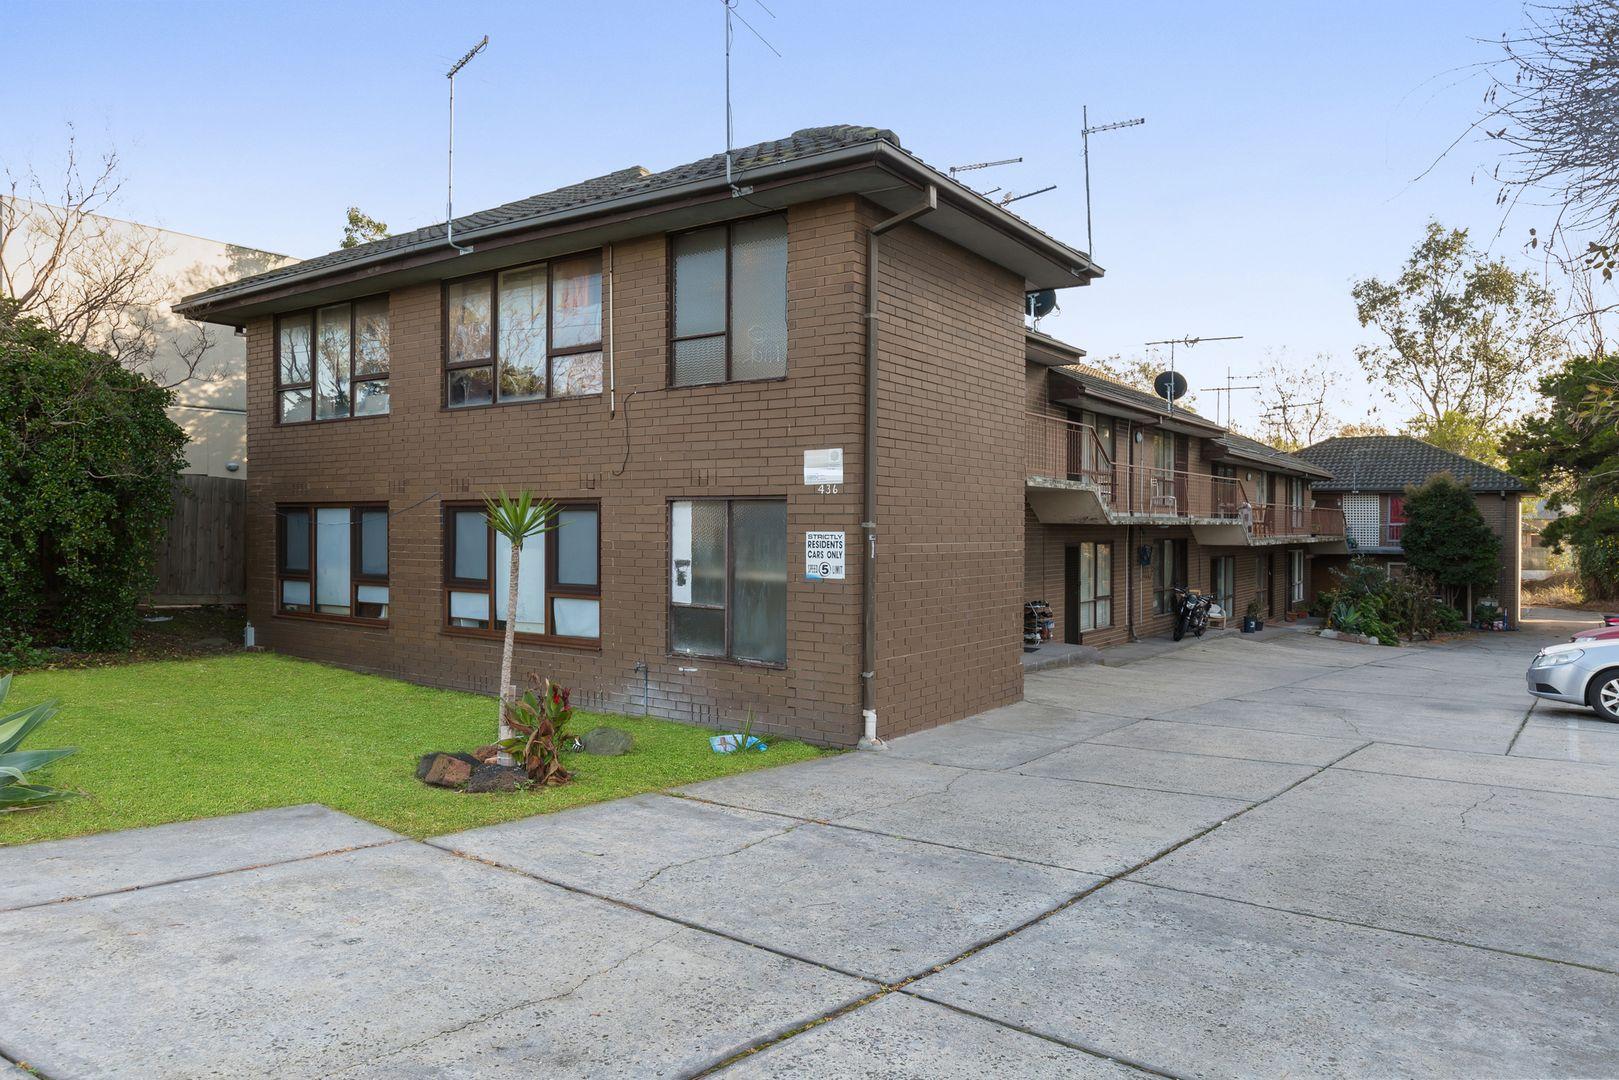 5/436 Geelong Road, West Footscray VIC 3012, Image 0